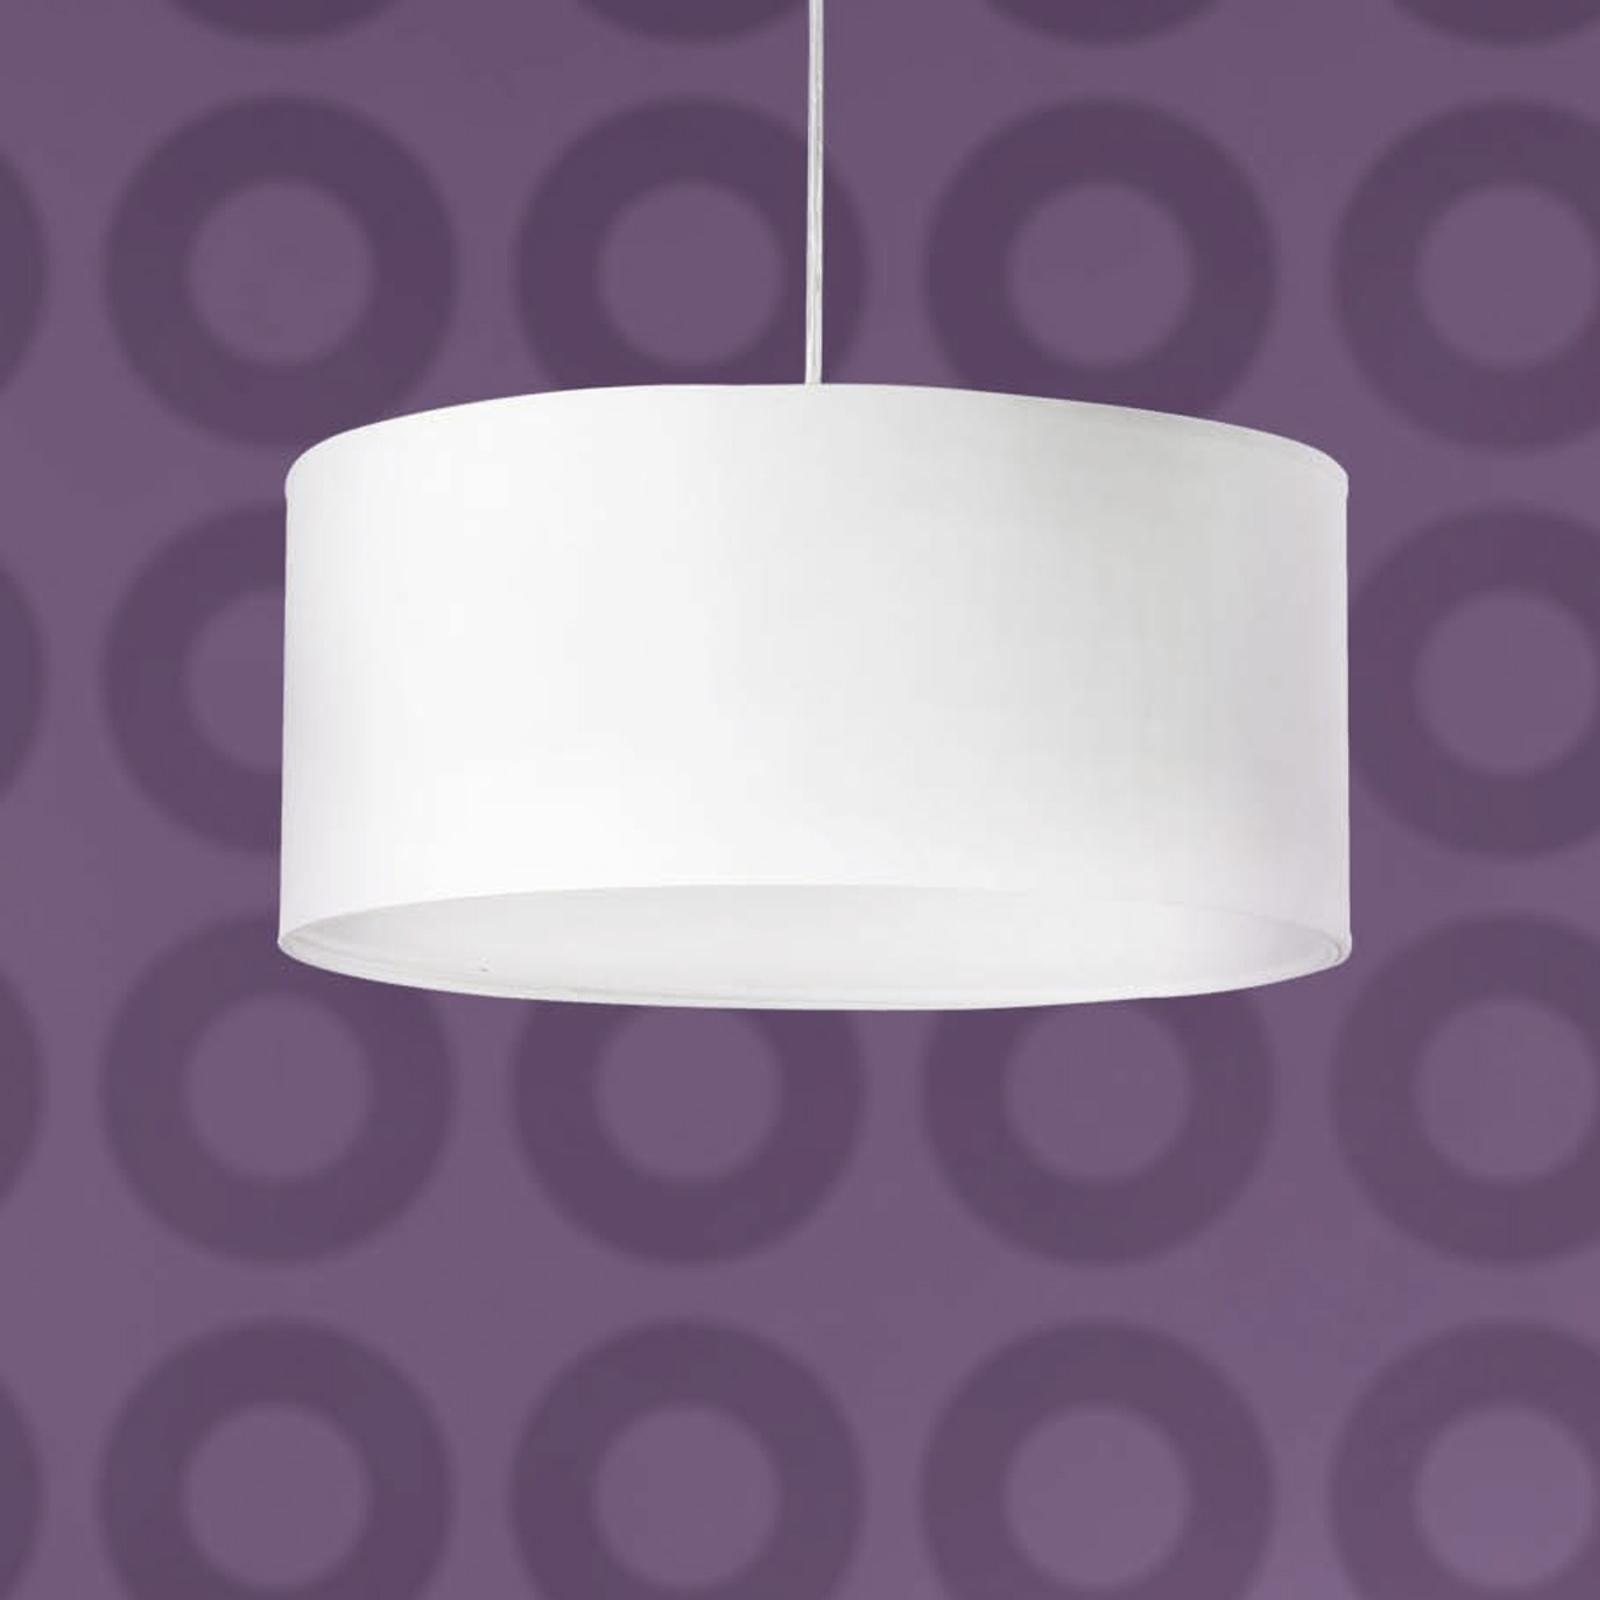 SEEN Elegant Pendant Lamp 40 cm_3506830_1